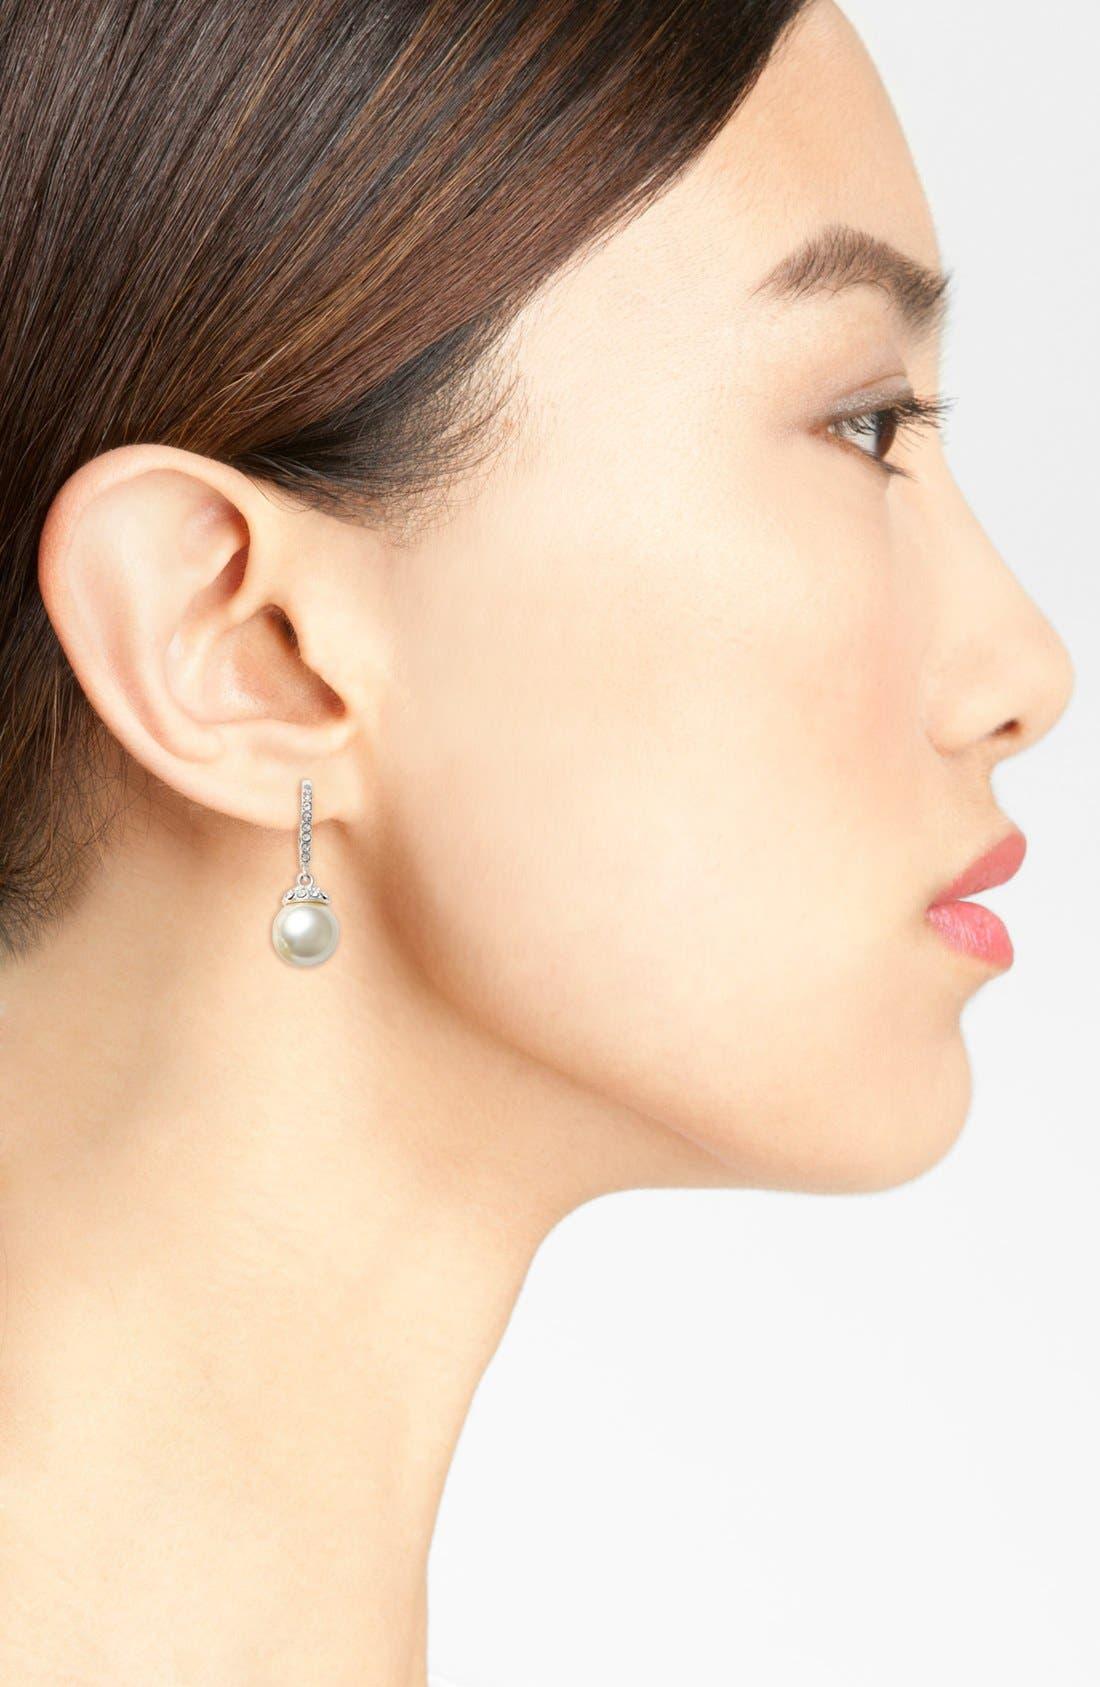 Imitation Pearl Drop Earrings,                             Alternate thumbnail 2, color,                             SILVER